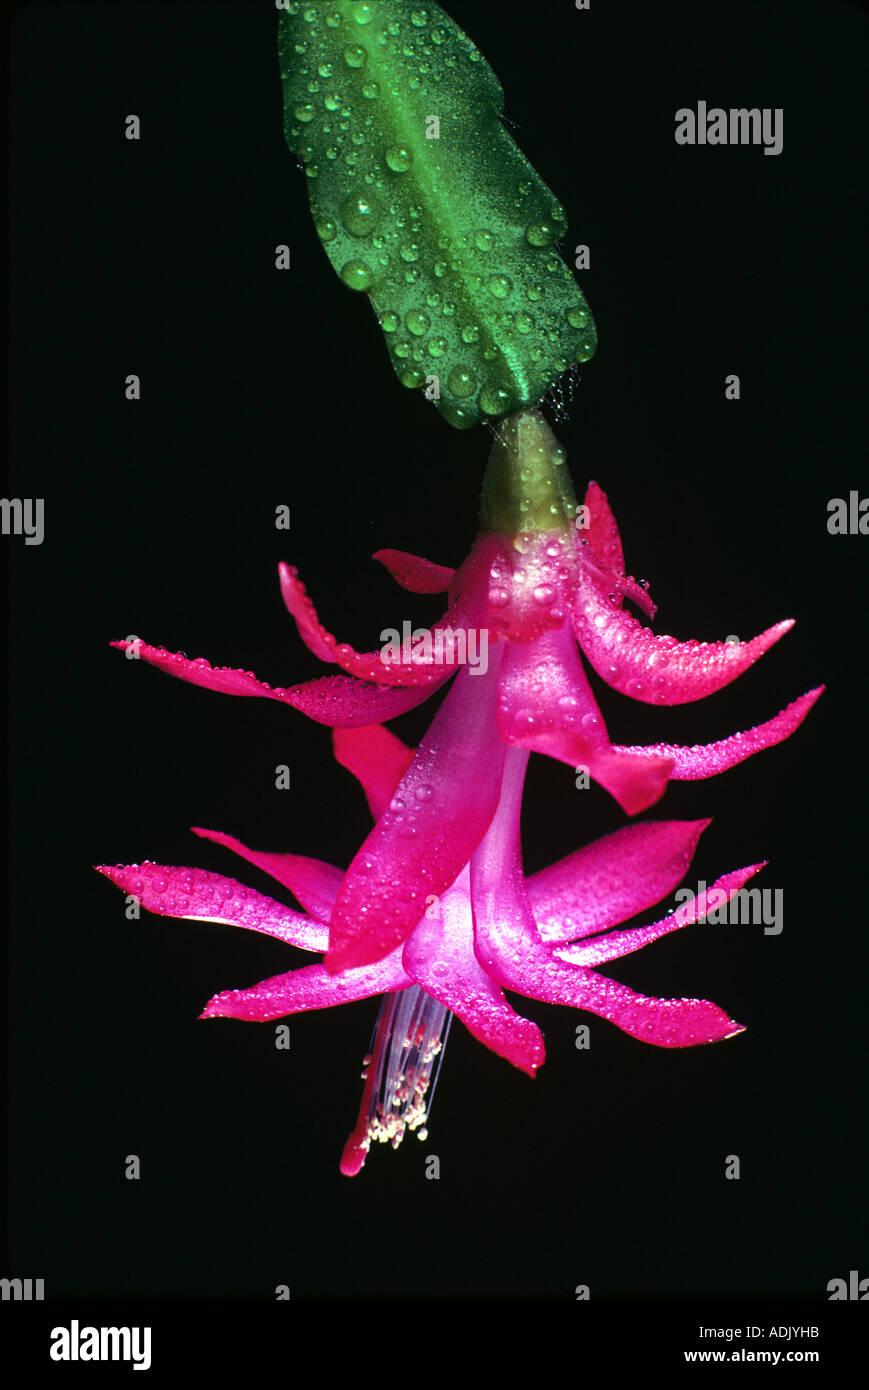 Christmas Cactus - Stock Image